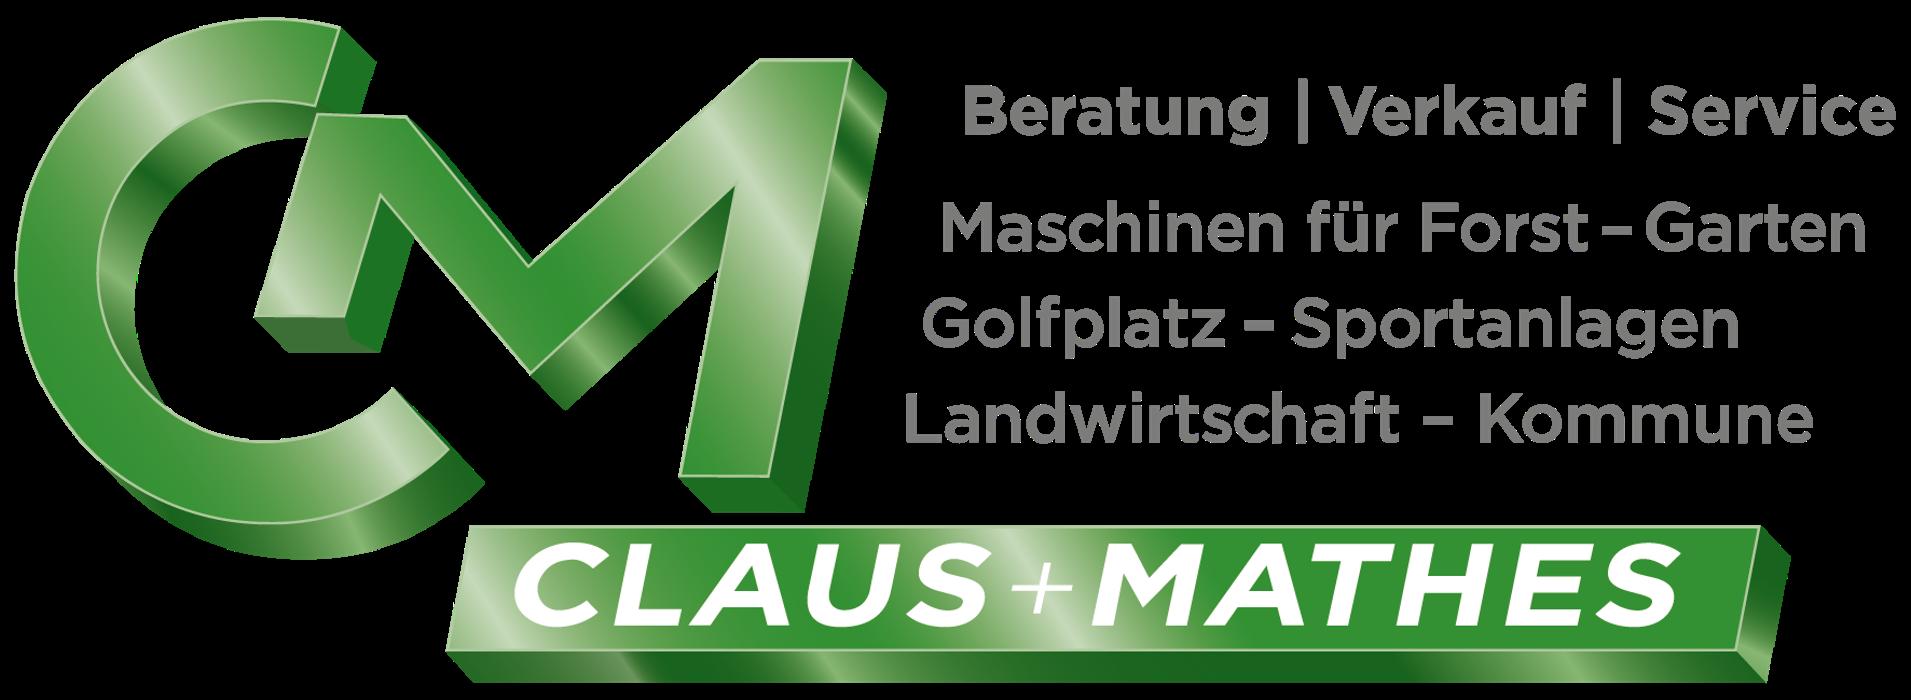 Claus & Mathes GmbH